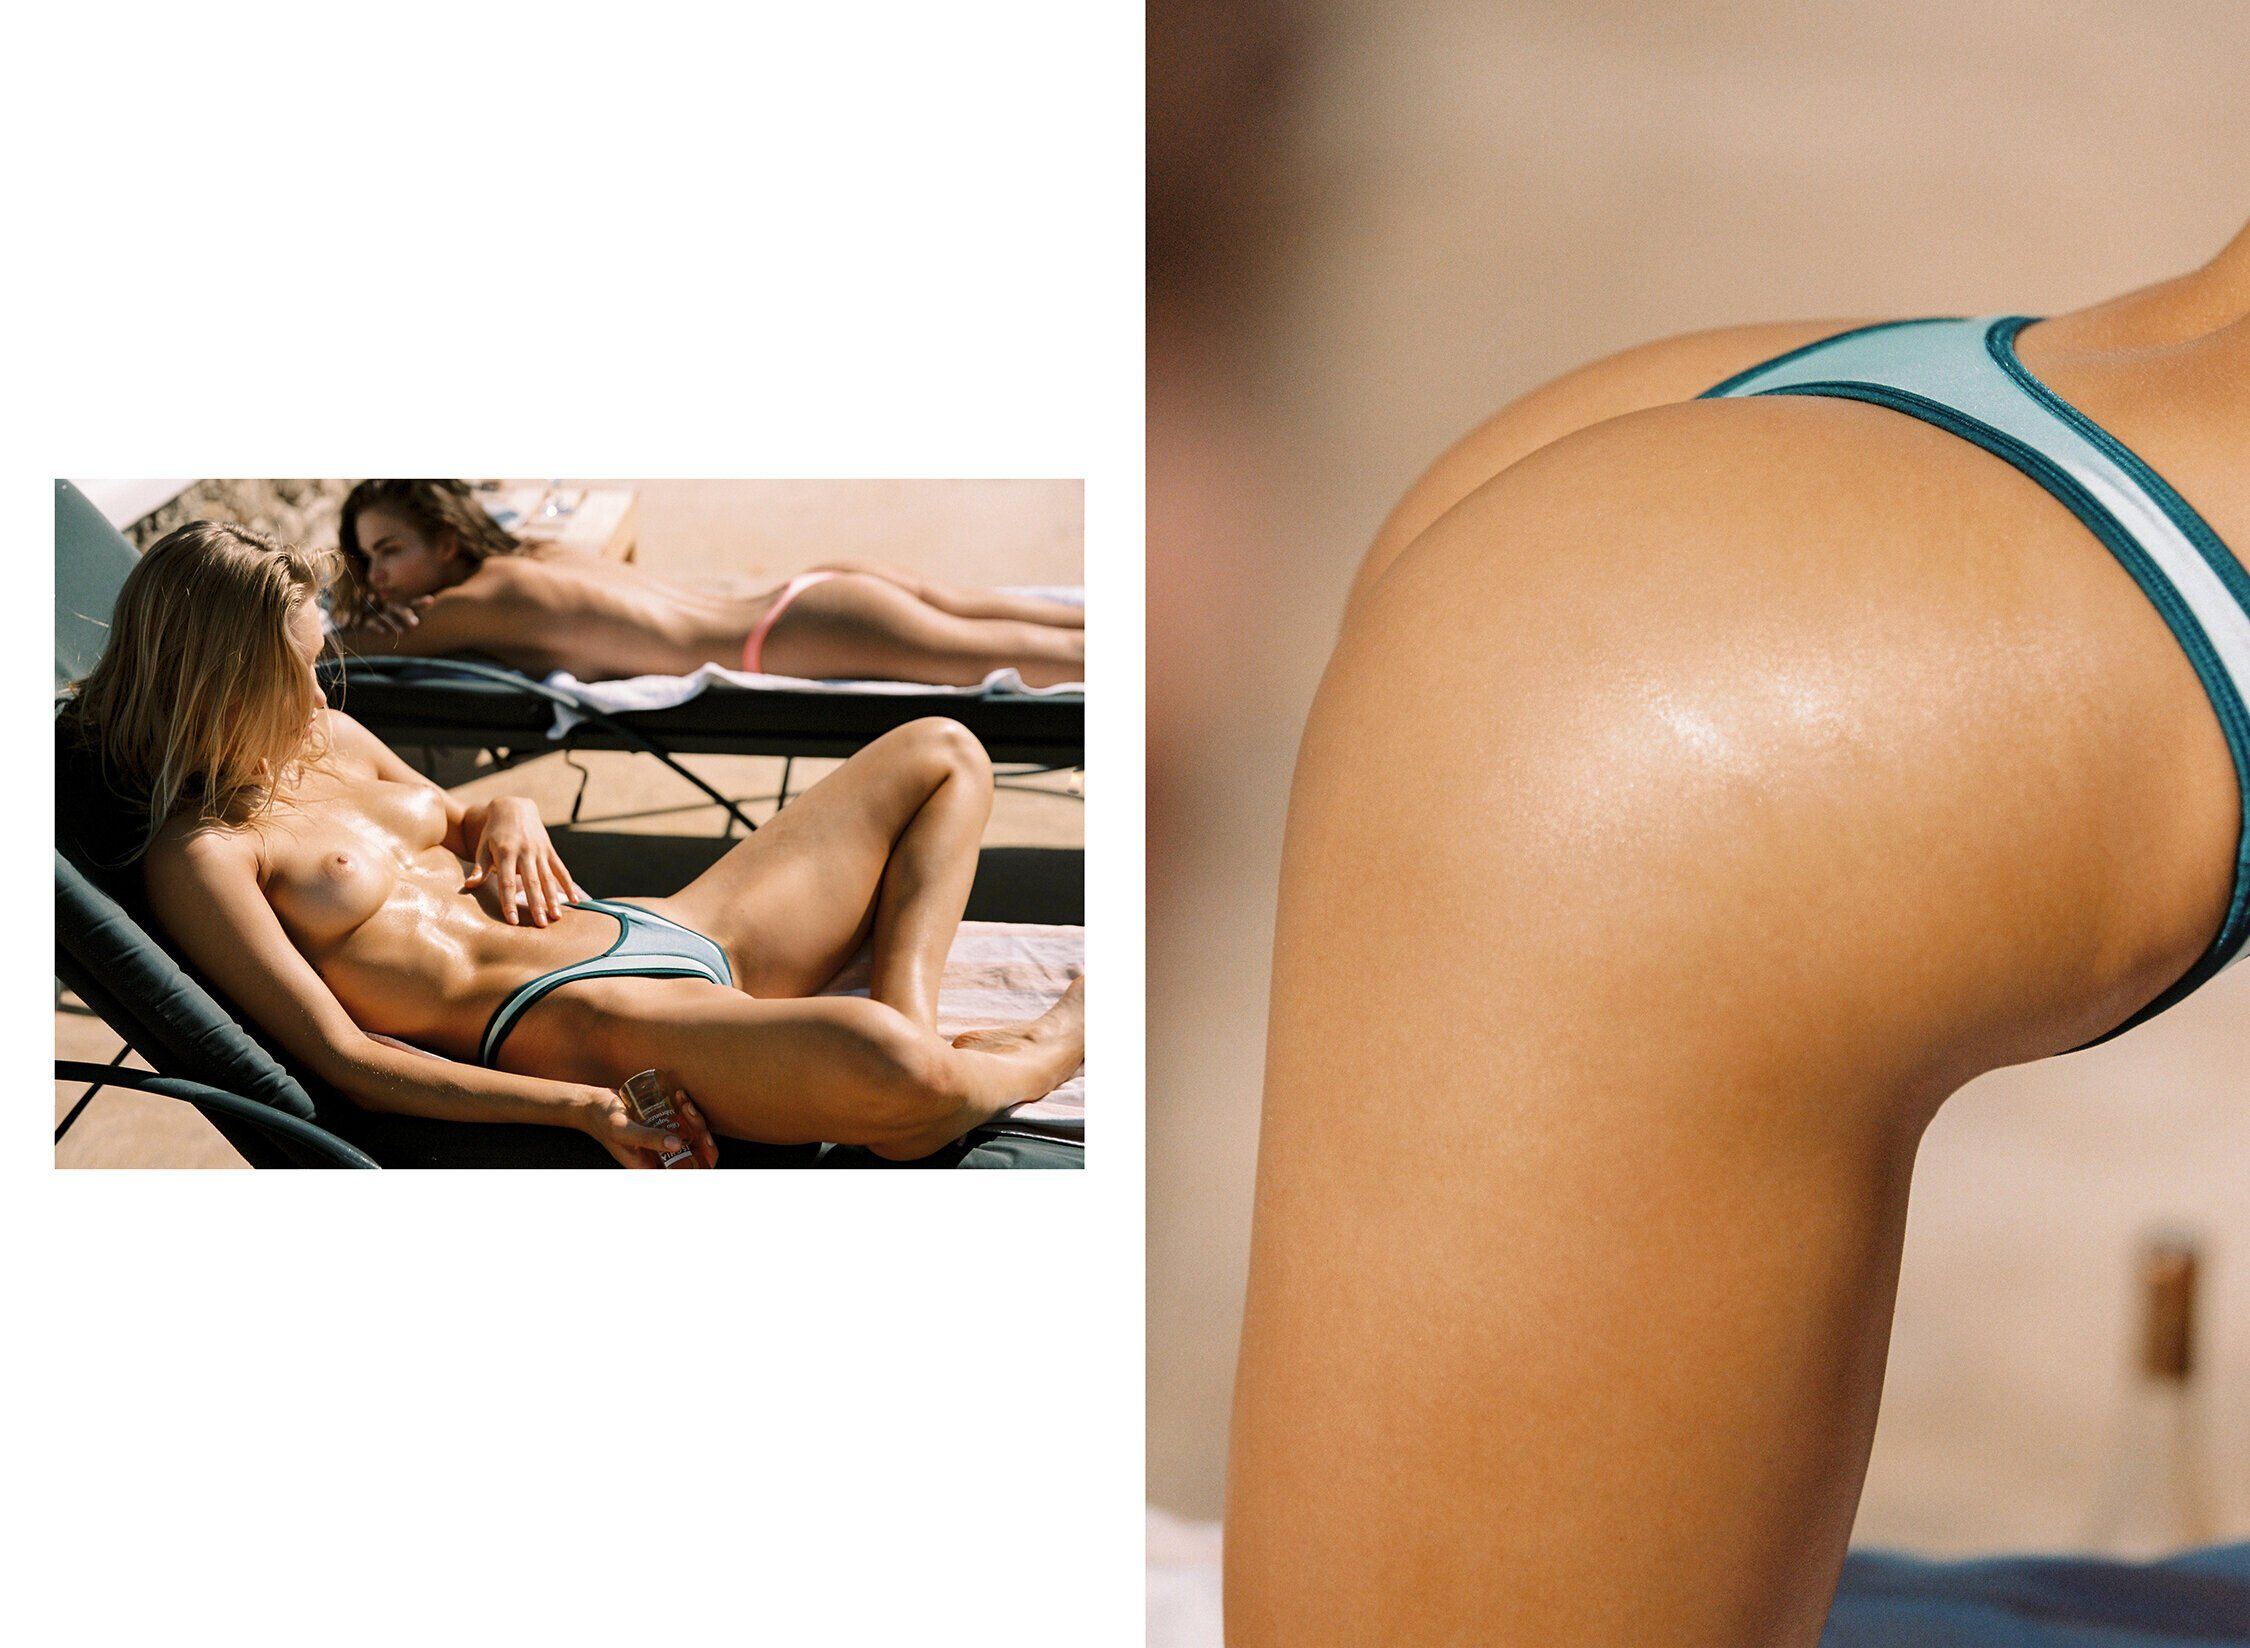 Robin Marjolein Holzken, Lotta Maybelake Nude & Sexy 0130